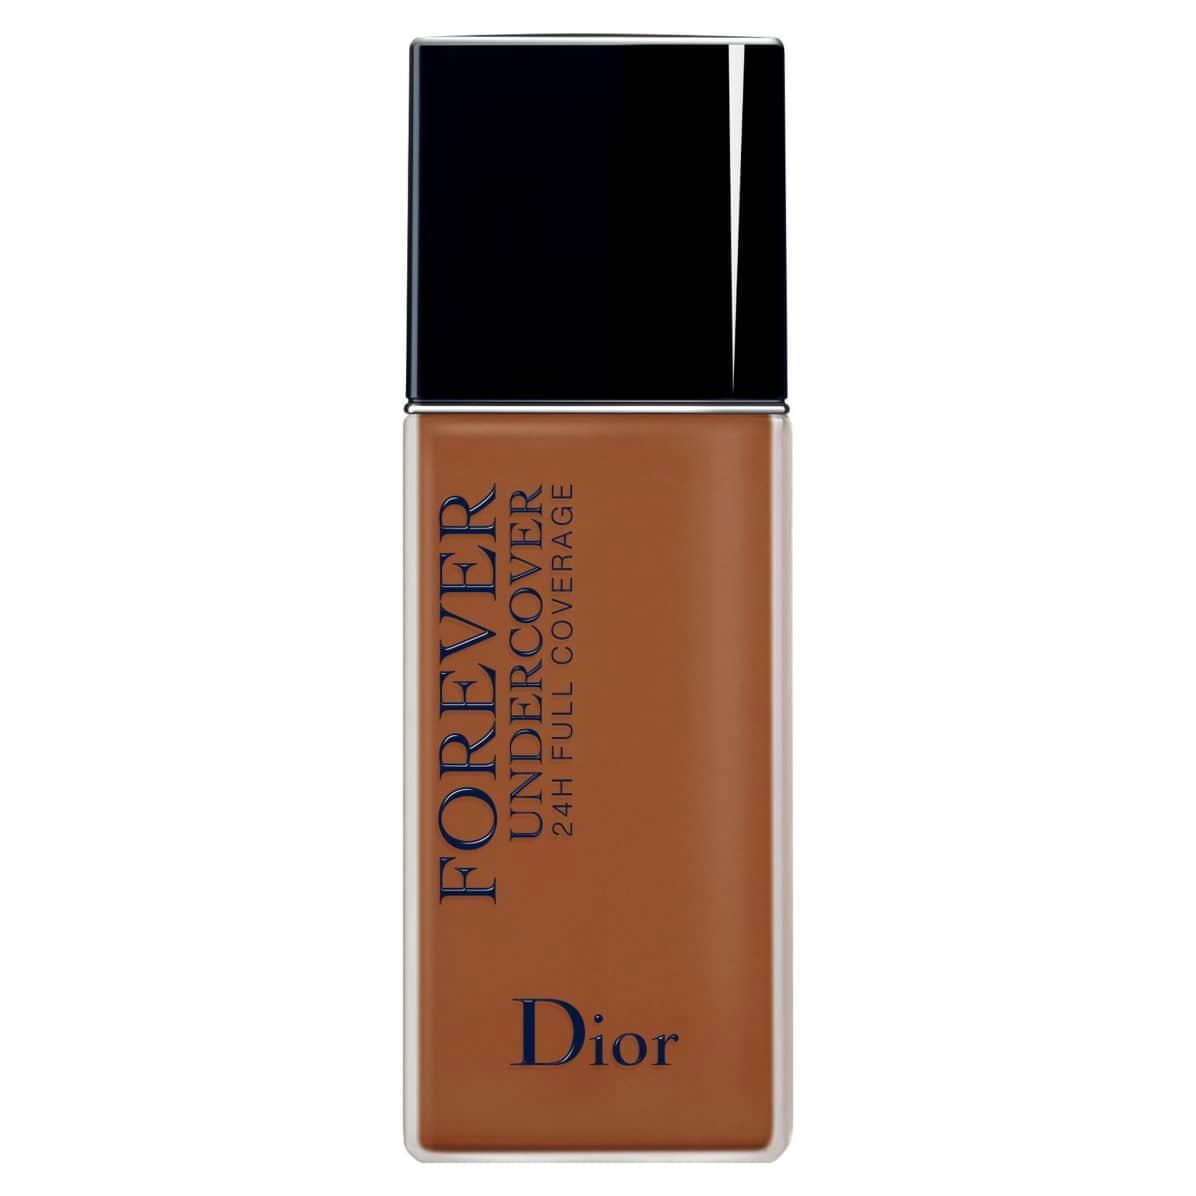 Dior Diorskin Forever Undercover Foundation Light Mocha 060